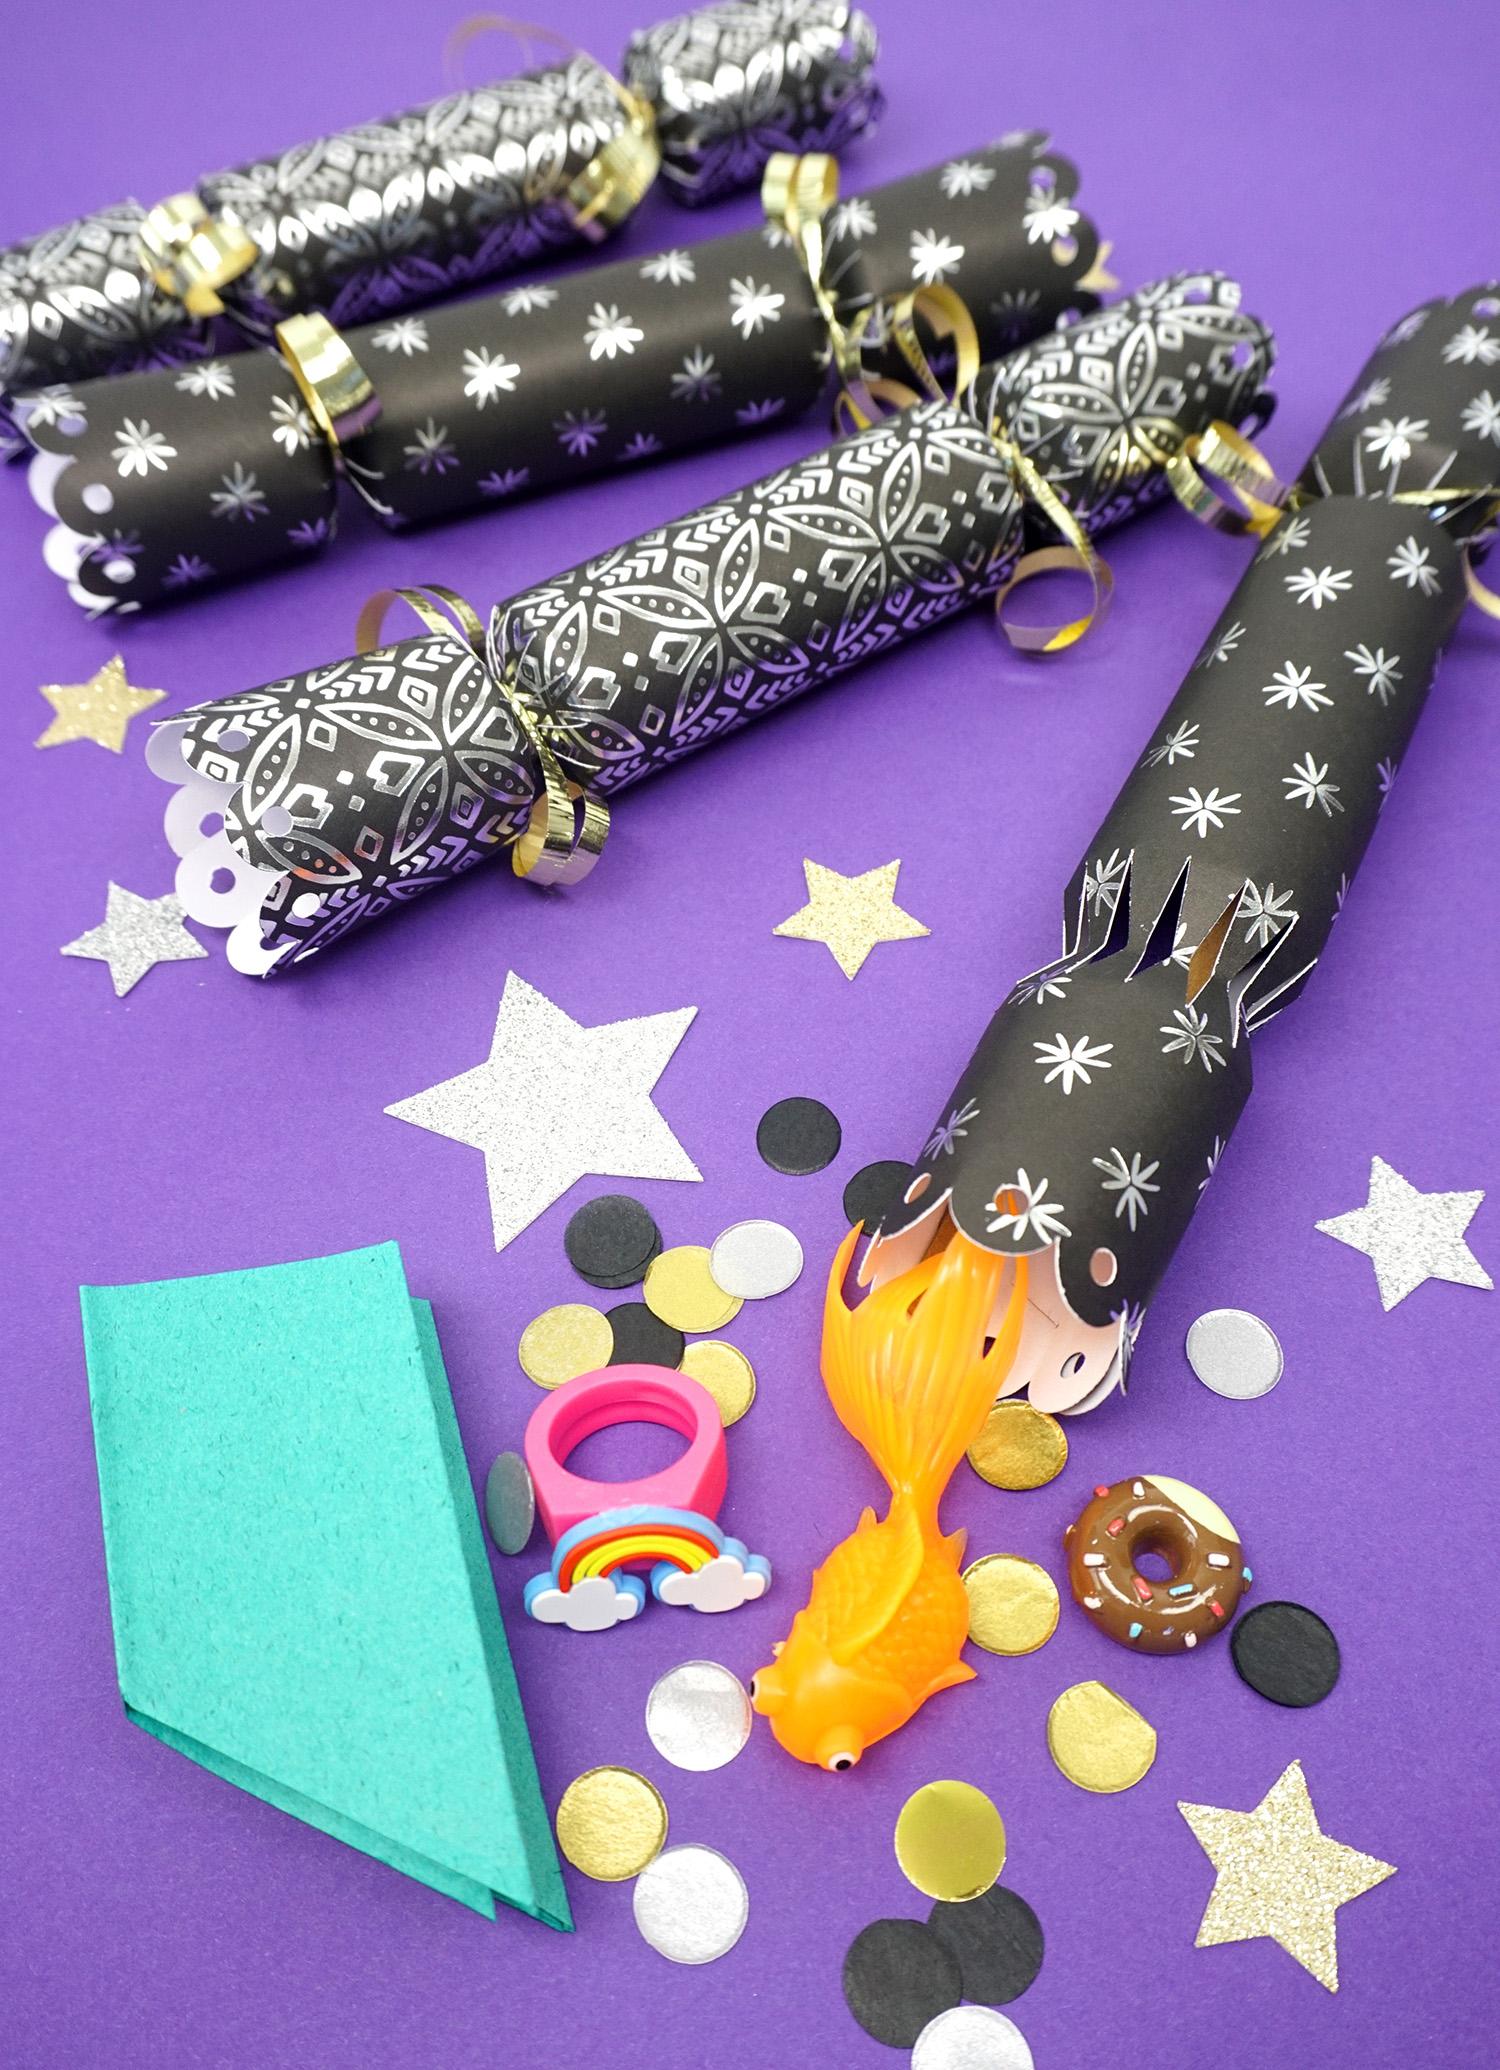 Christmas Crackers Diy.Diy Christmas Crackers Happiness Is Homemade